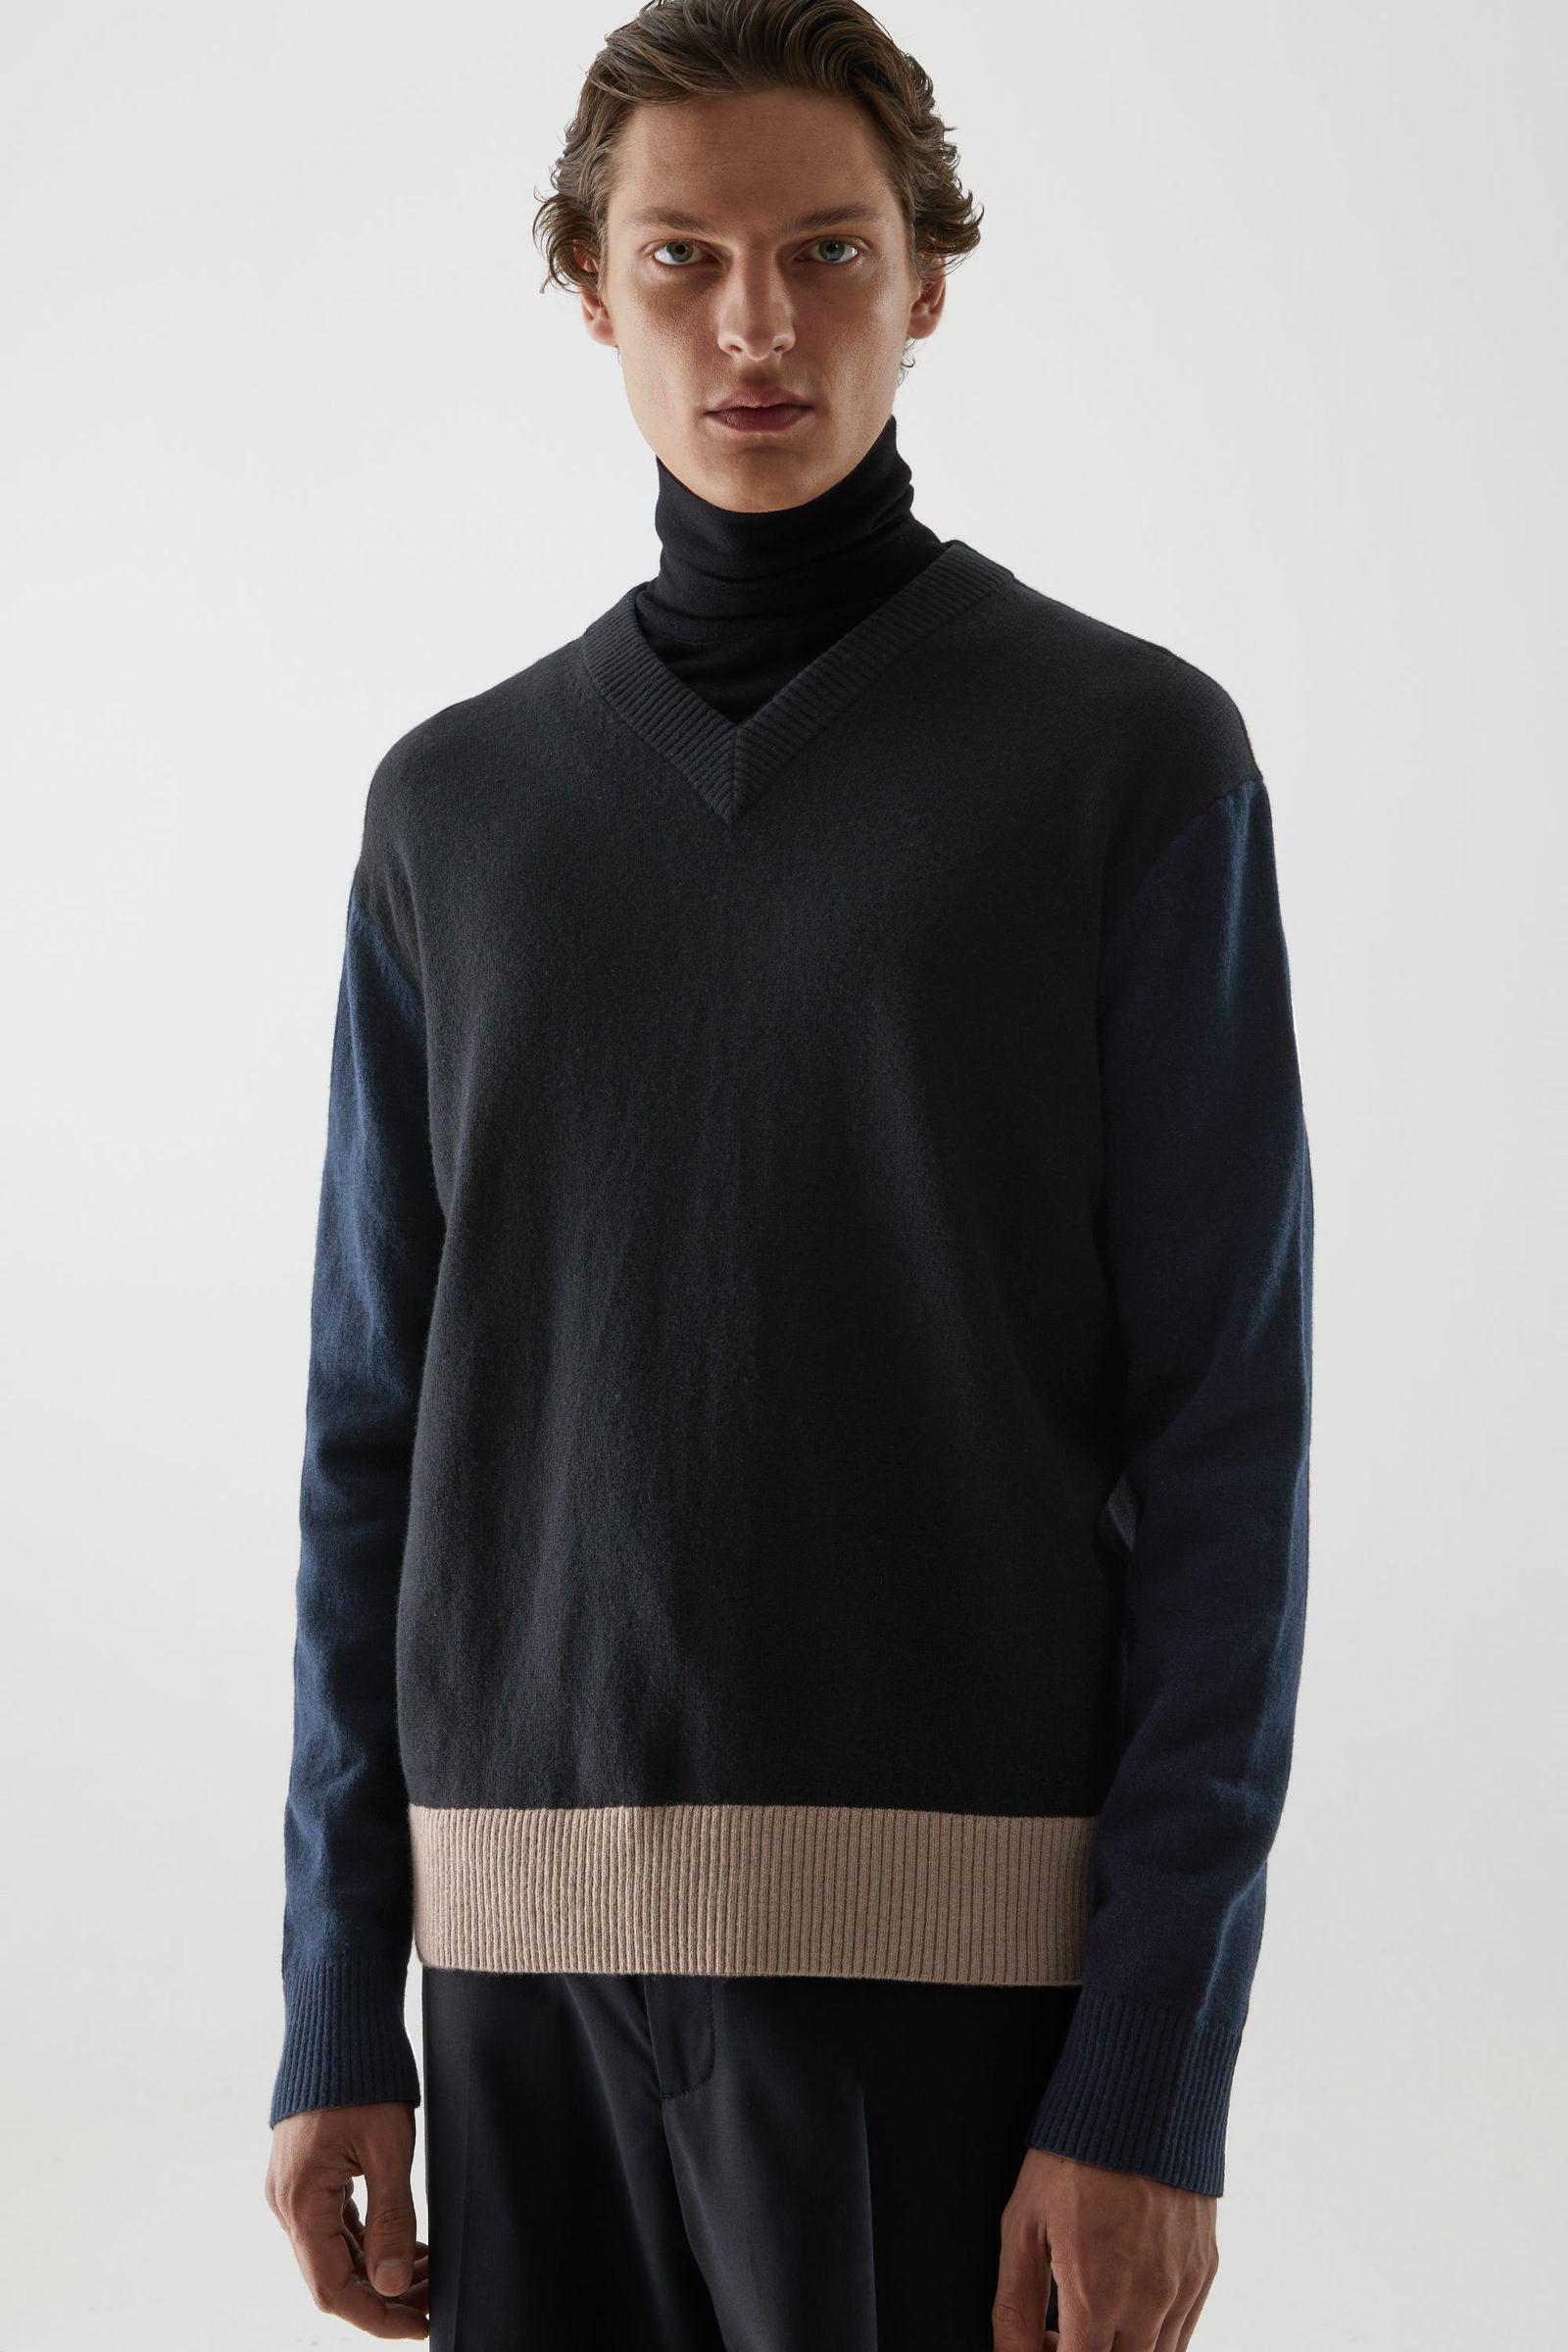 COS 컬러 블록 울 코튼 스웨터의 브라운 / 네이비 / 블랙컬러 ECOMLook입니다.